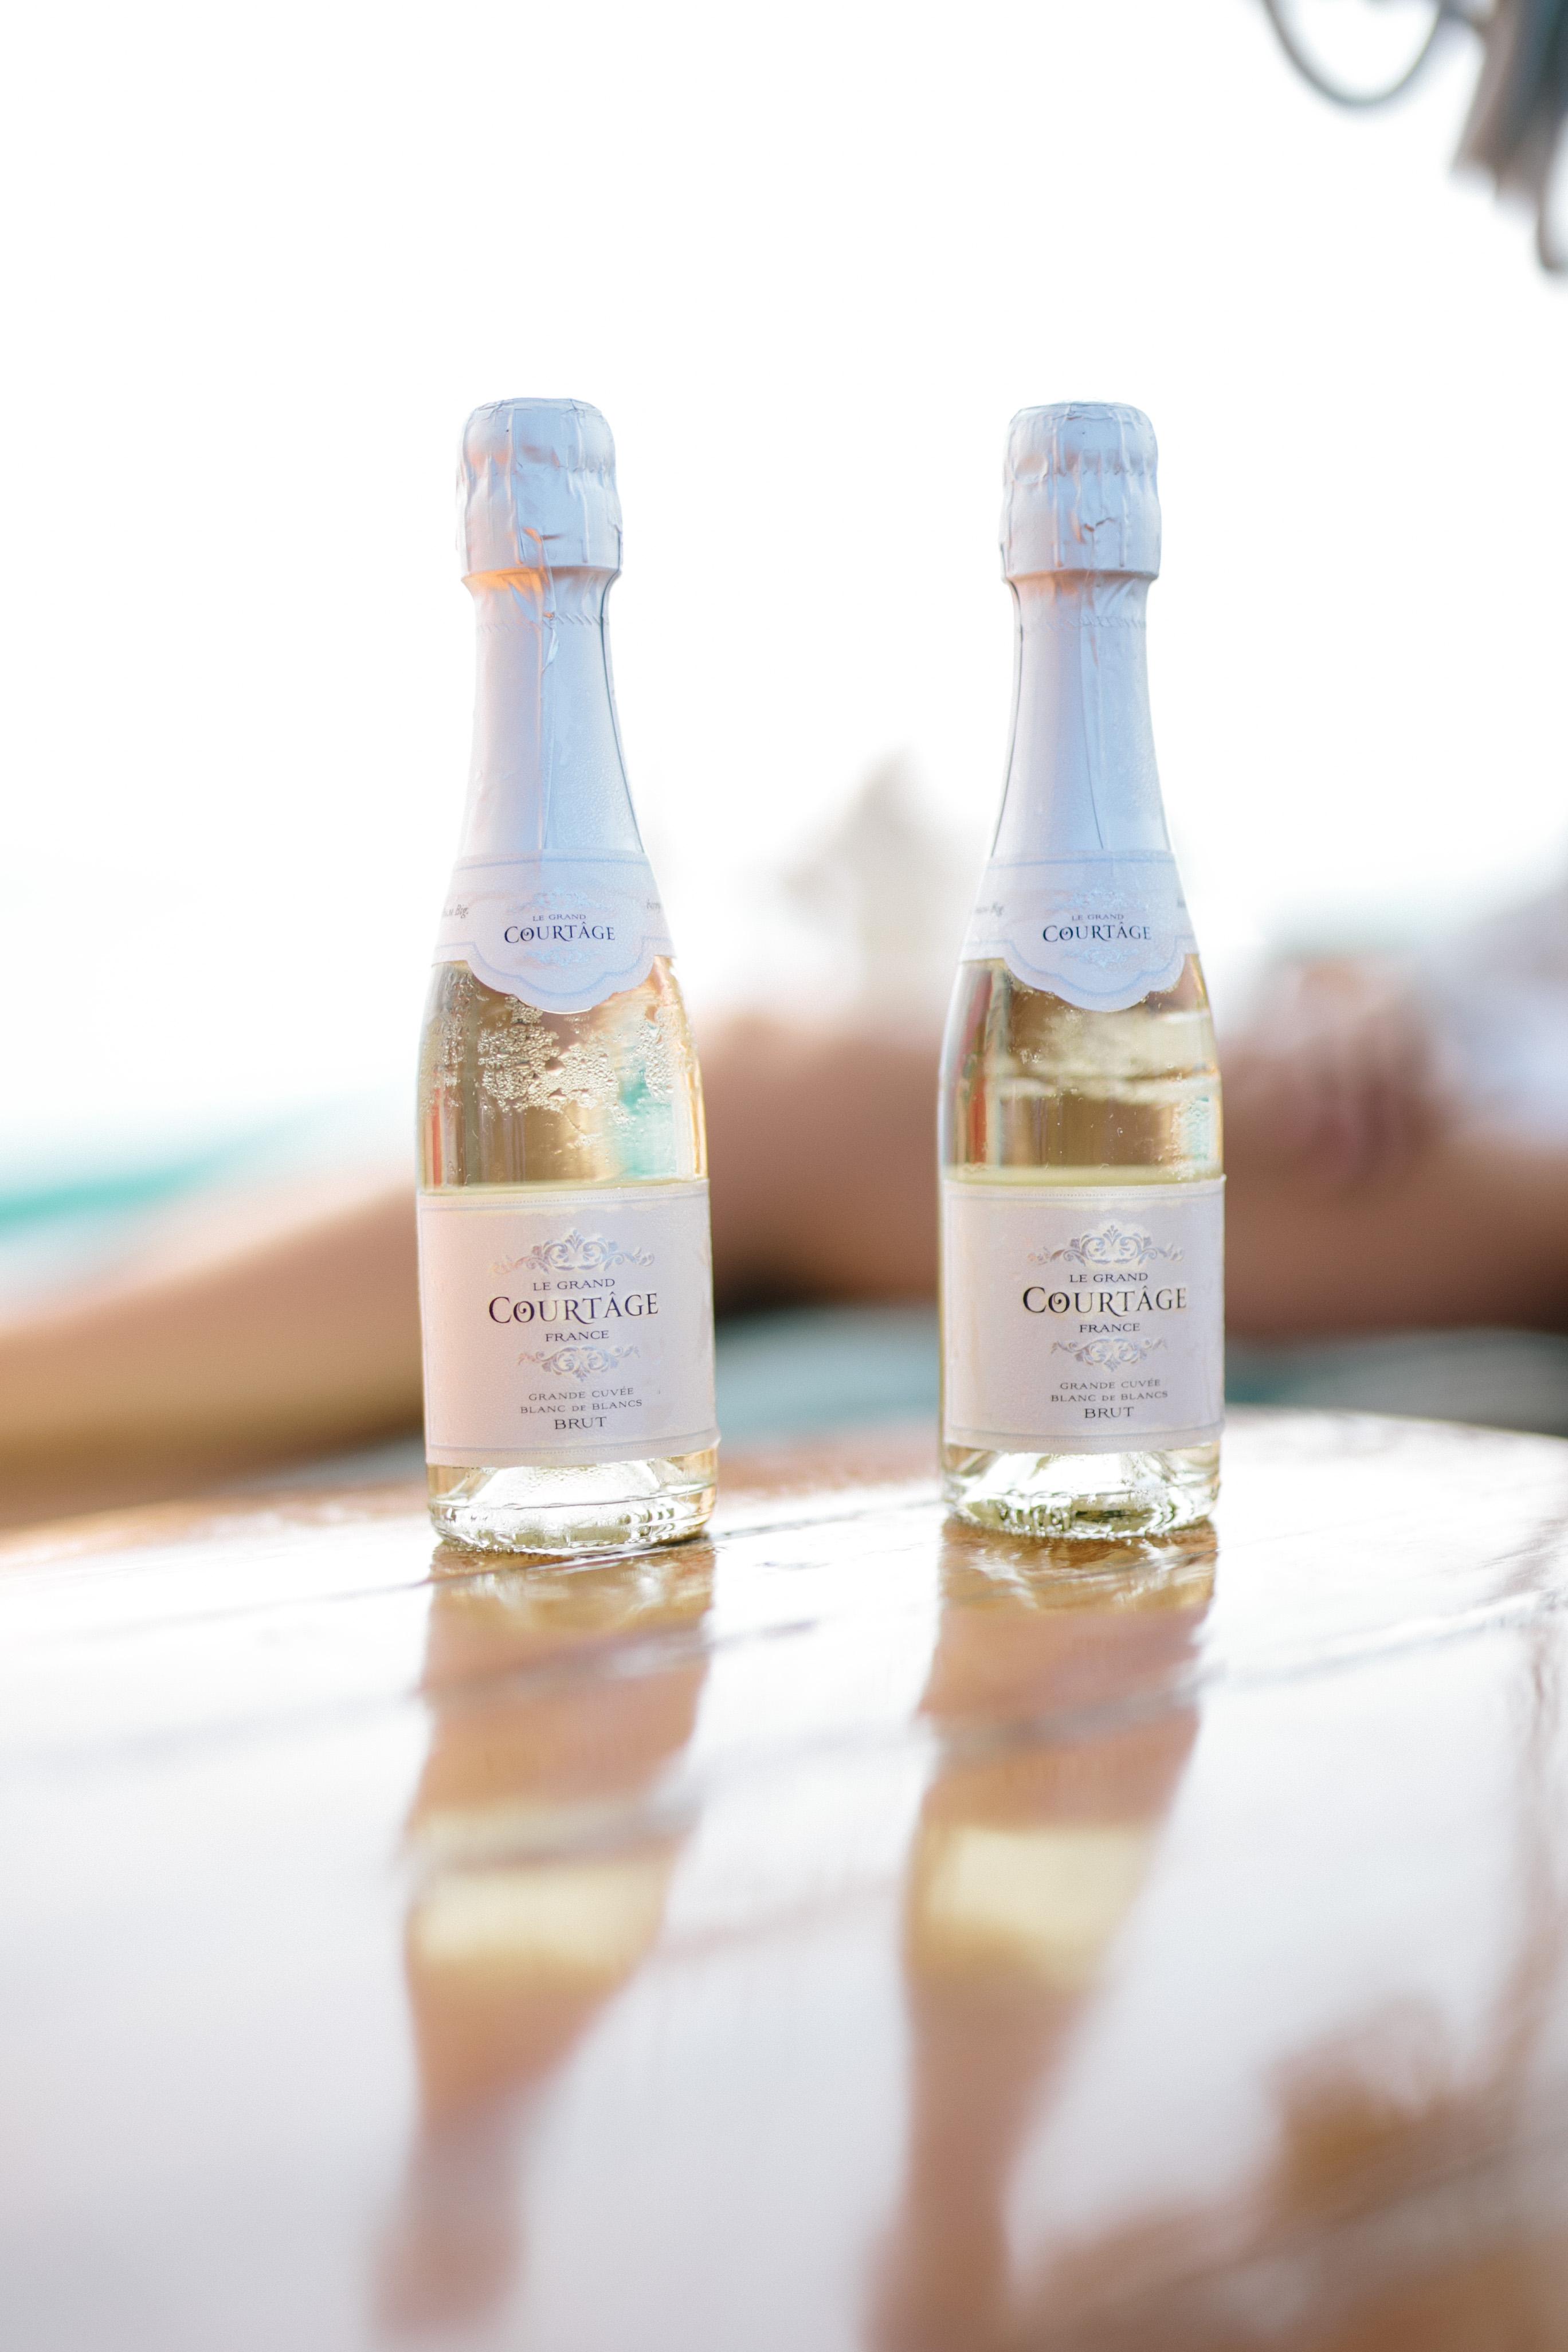 Le Gran Courtage Mini Champagne | Sailing on The Big Island | Honu Sail Charters | Sailing Kona Hawaii | Untraditional Holiday Celebrating | Sailing for Christmas | elanaloo.com